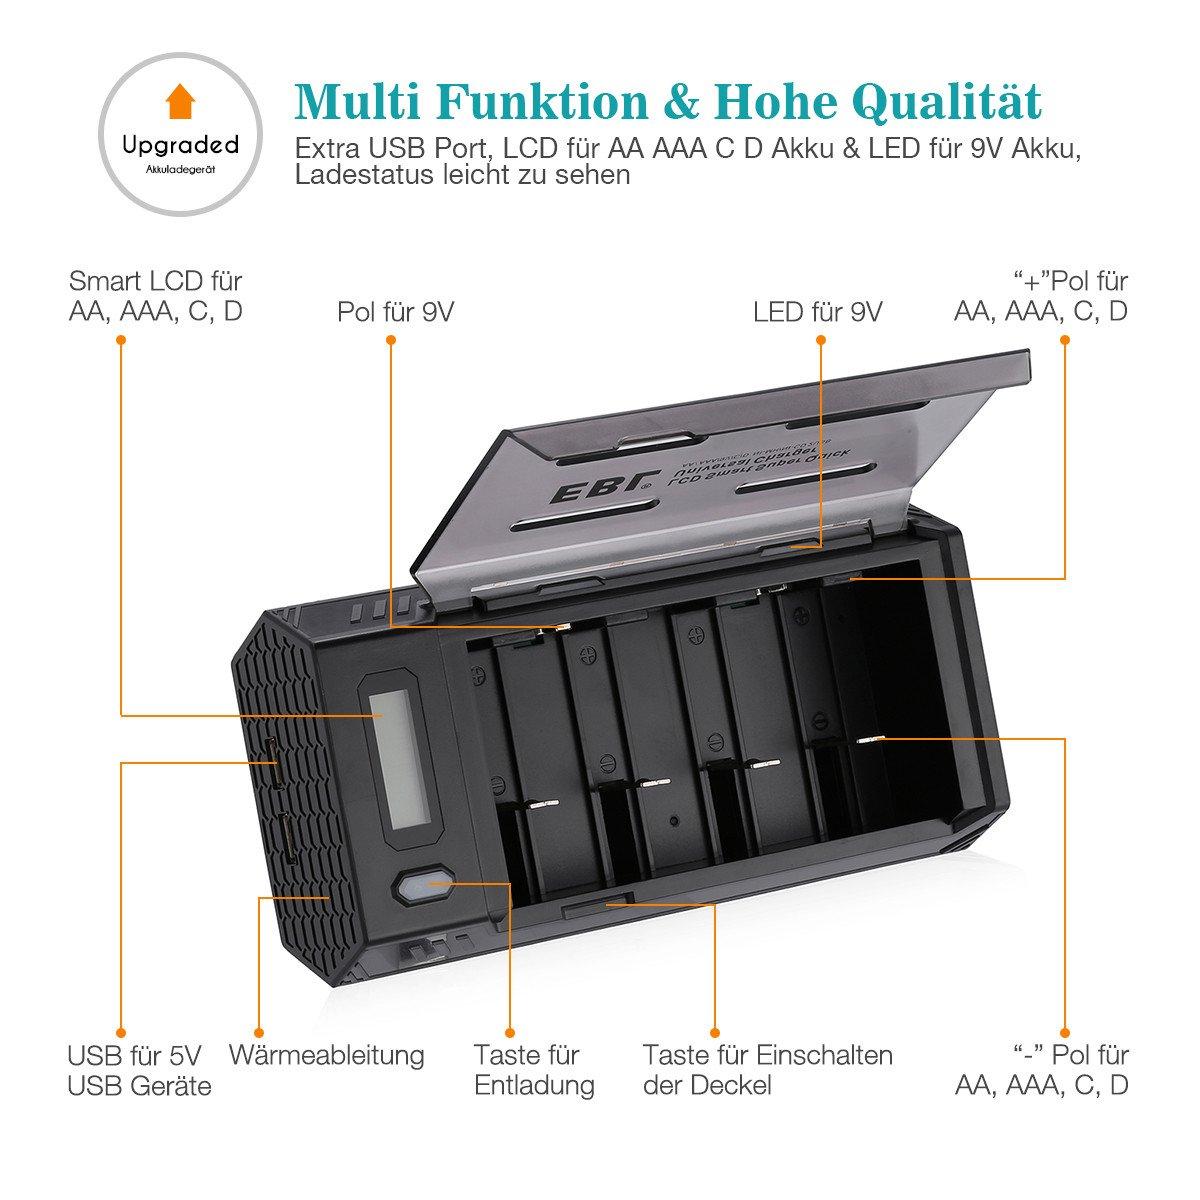 EBL 908 Universal LCD Akkuladegerät und Entladegerät für Ni-MH Ni-CD C D 9V AA AAA wiederaufladbare Akkus mit 2 USB Port (Akkus nicht inkl.)